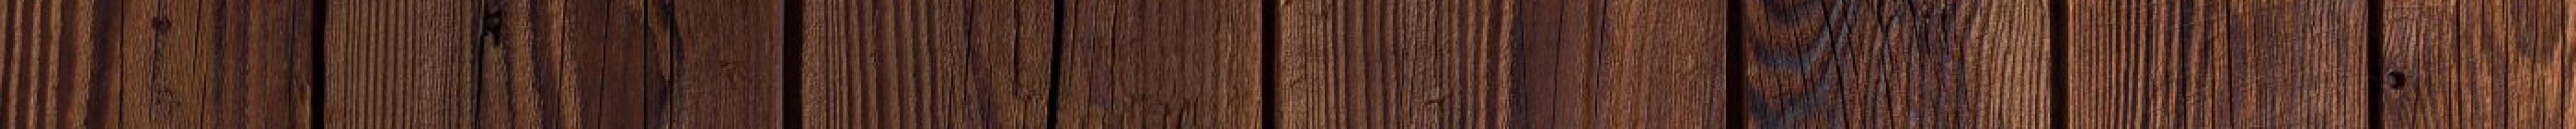 Northbrook Wood Fencing